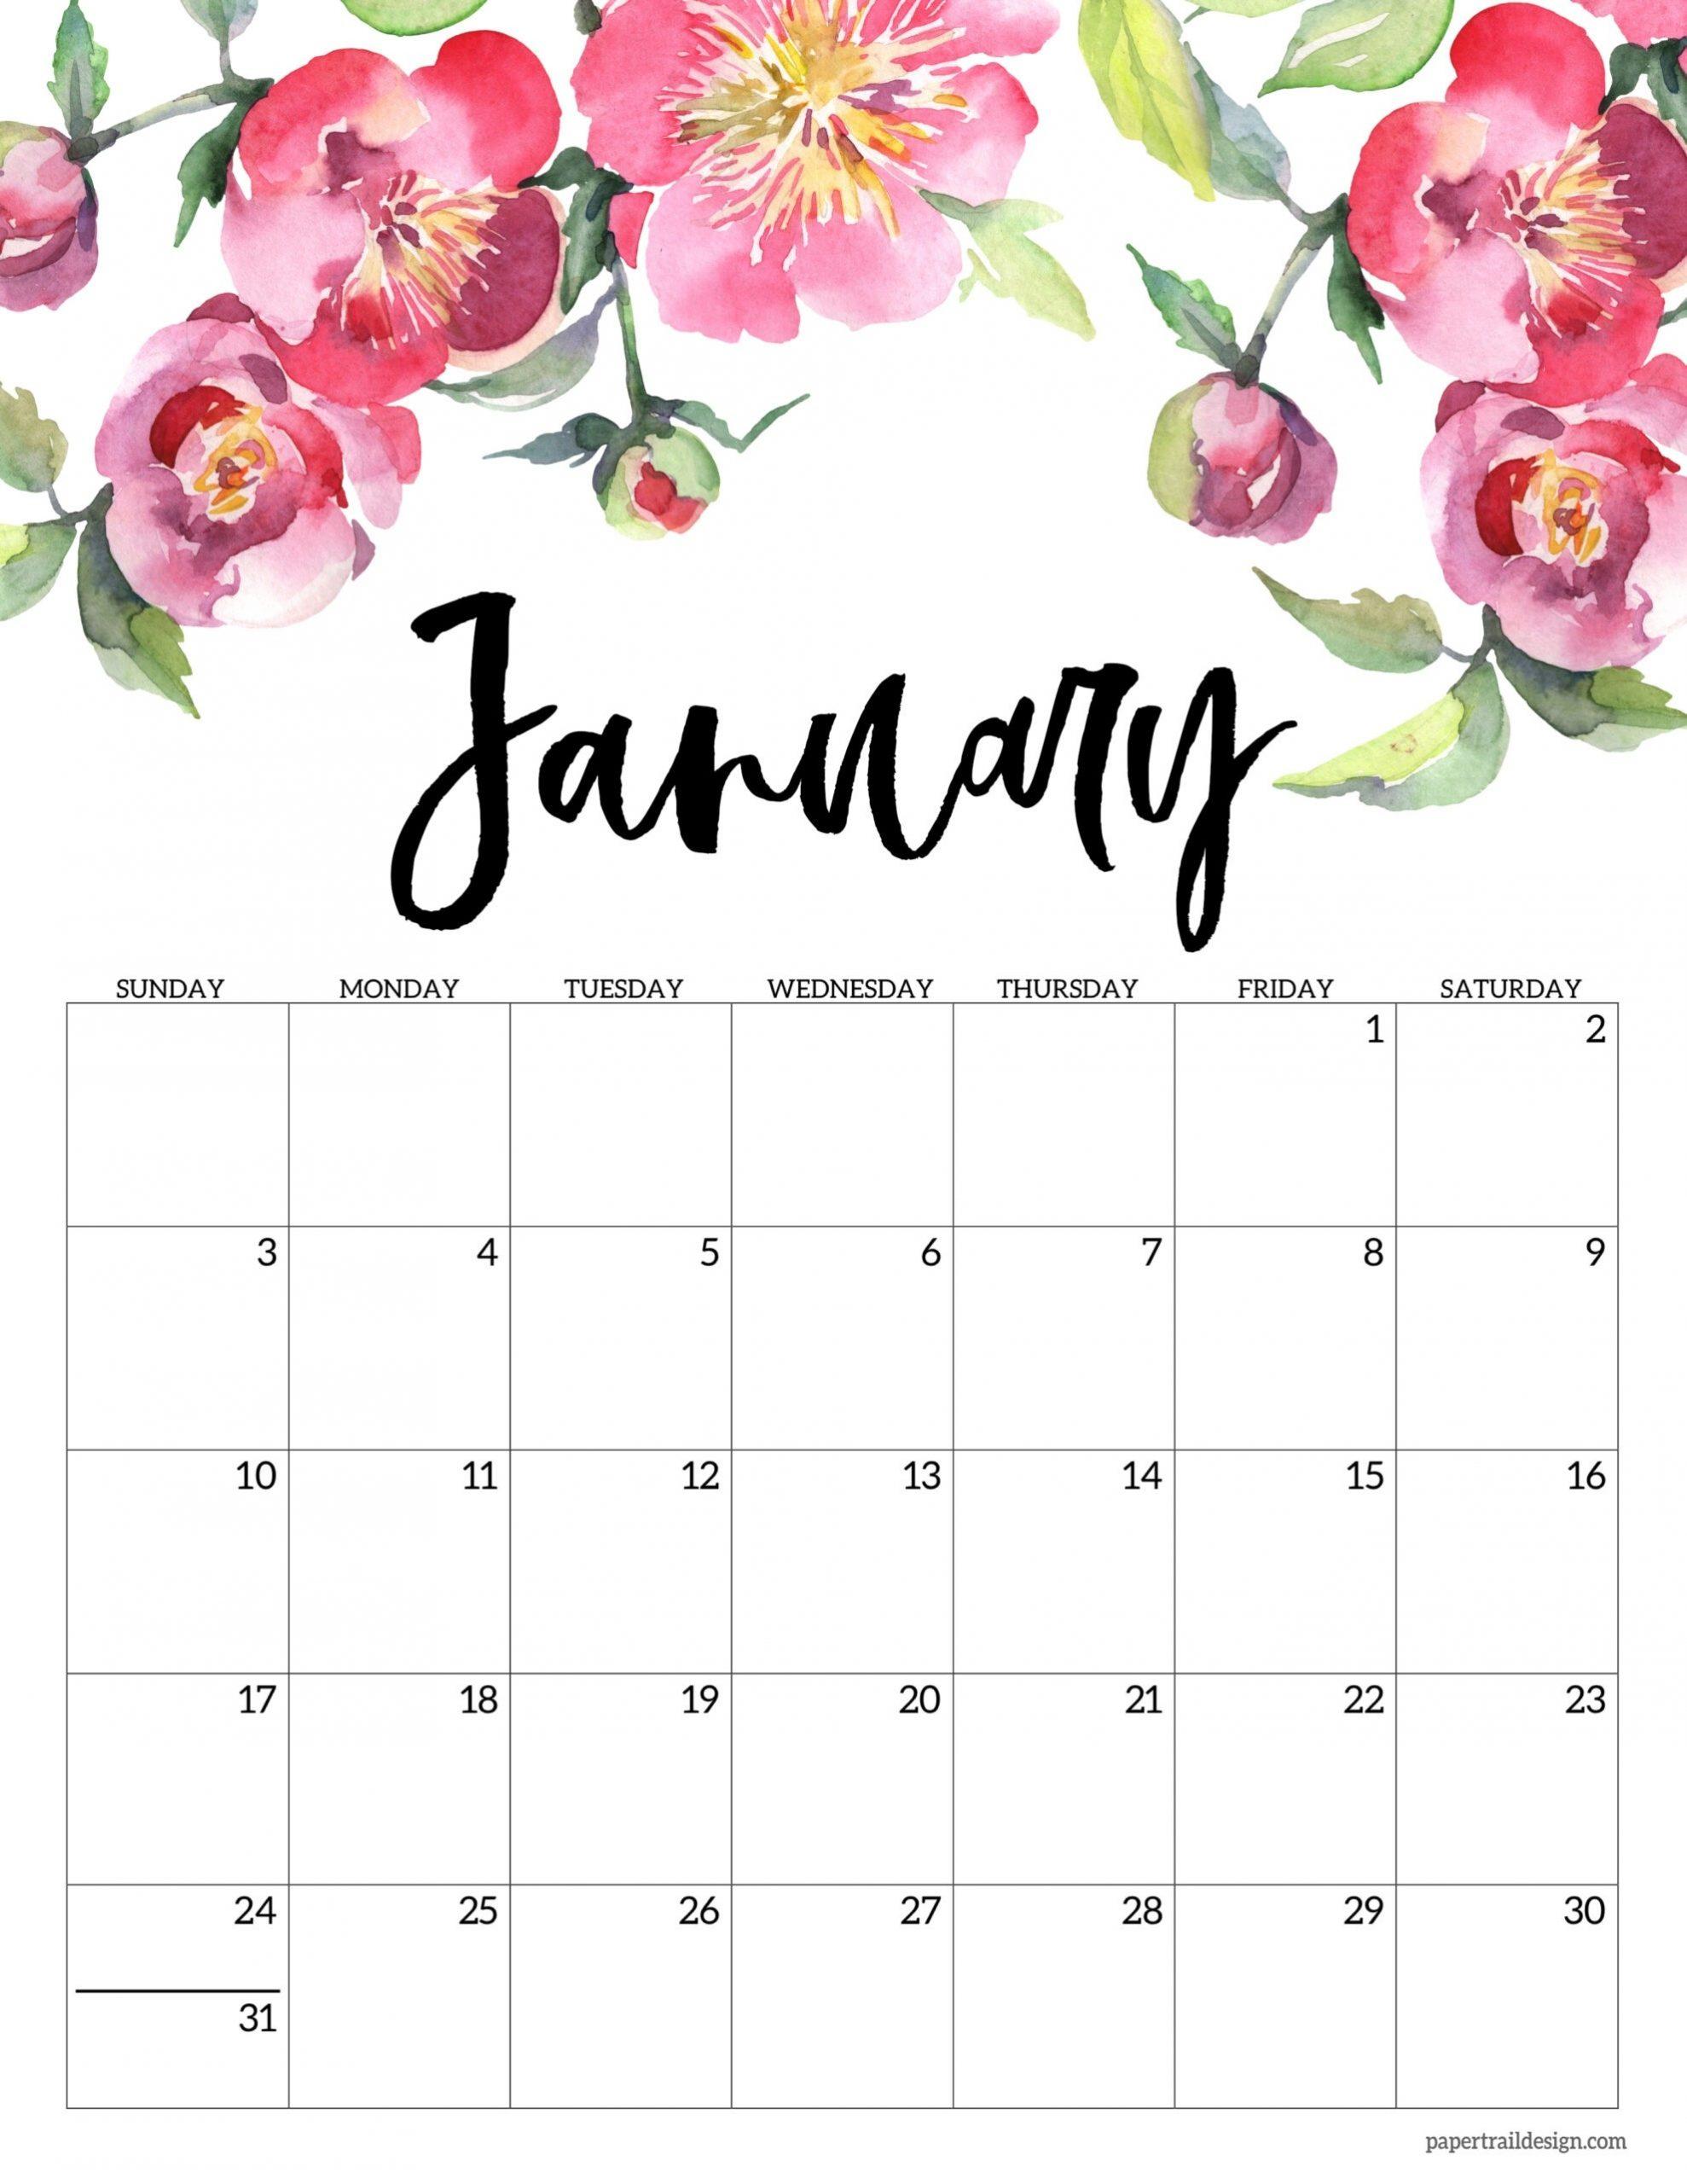 Free Printable 2021 Floral Calendar | Paper Trail Design  Girly Monthly Calendar Printable 2021